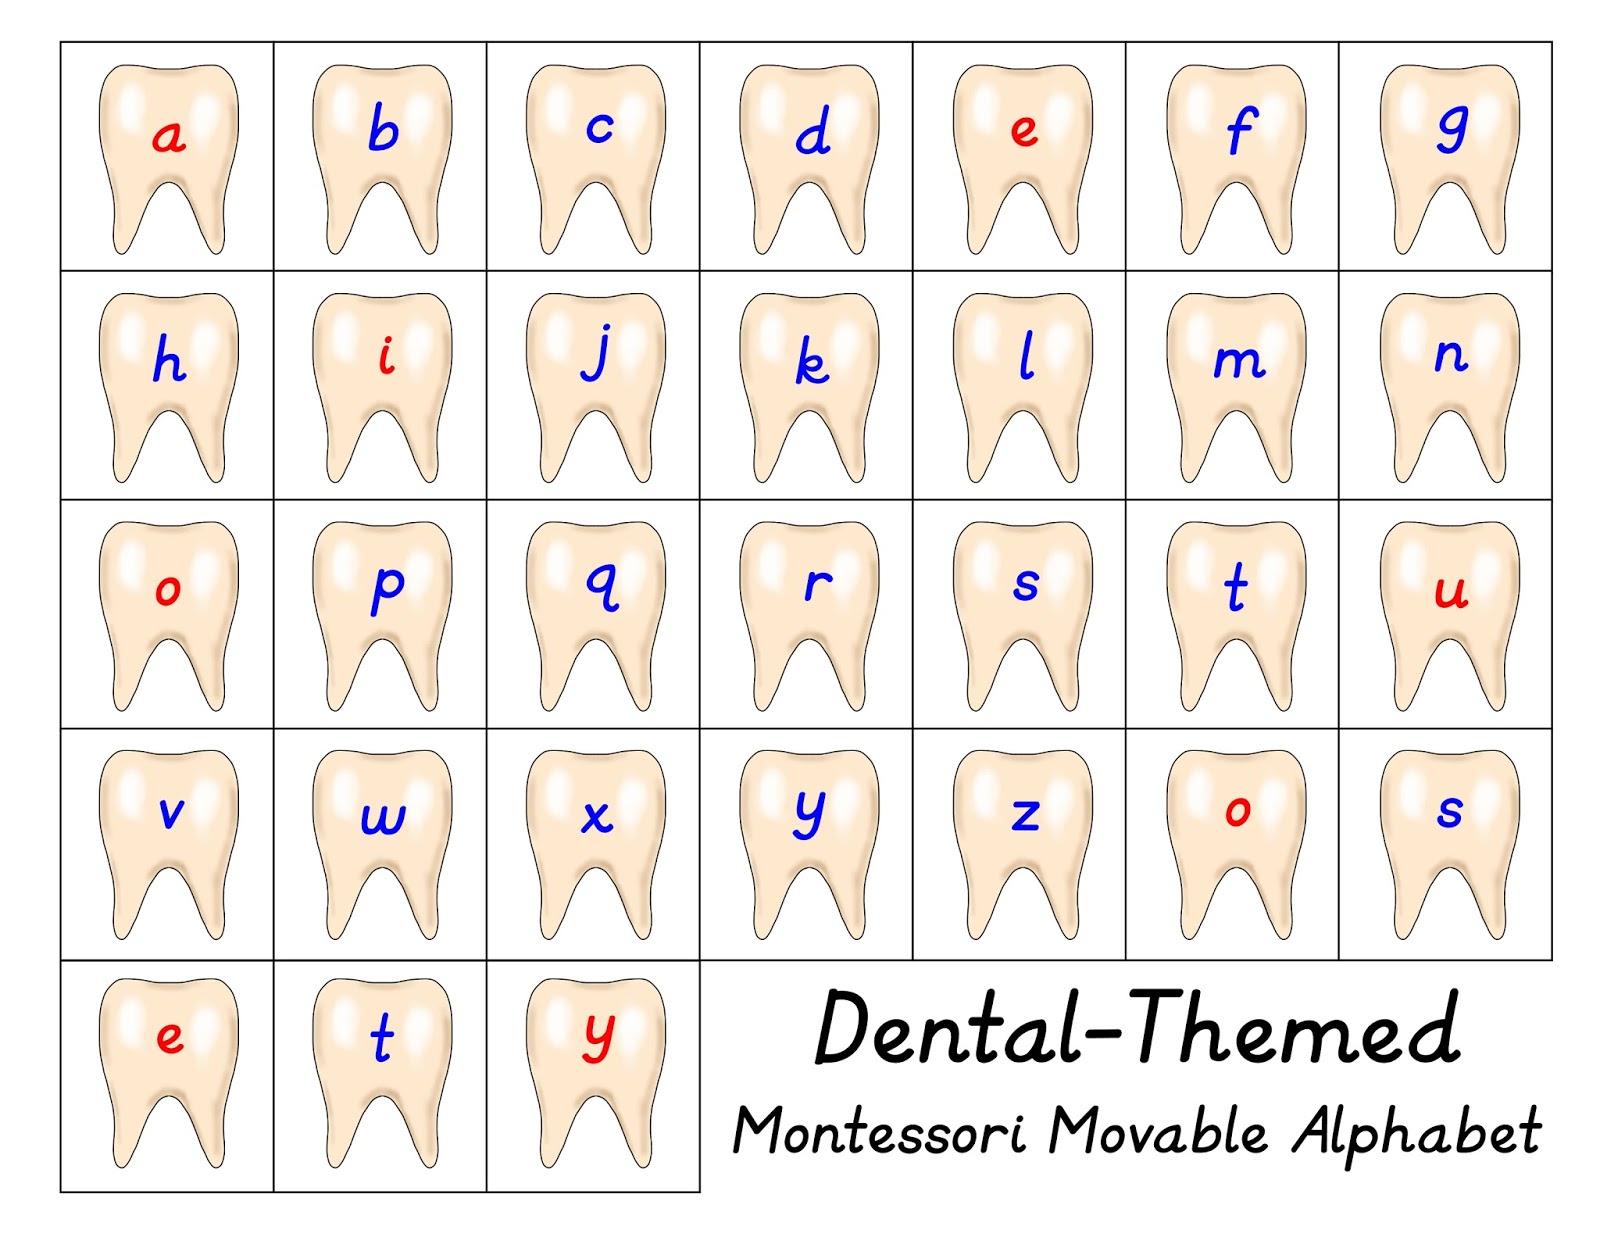 Dental Themed Movable Alphabet